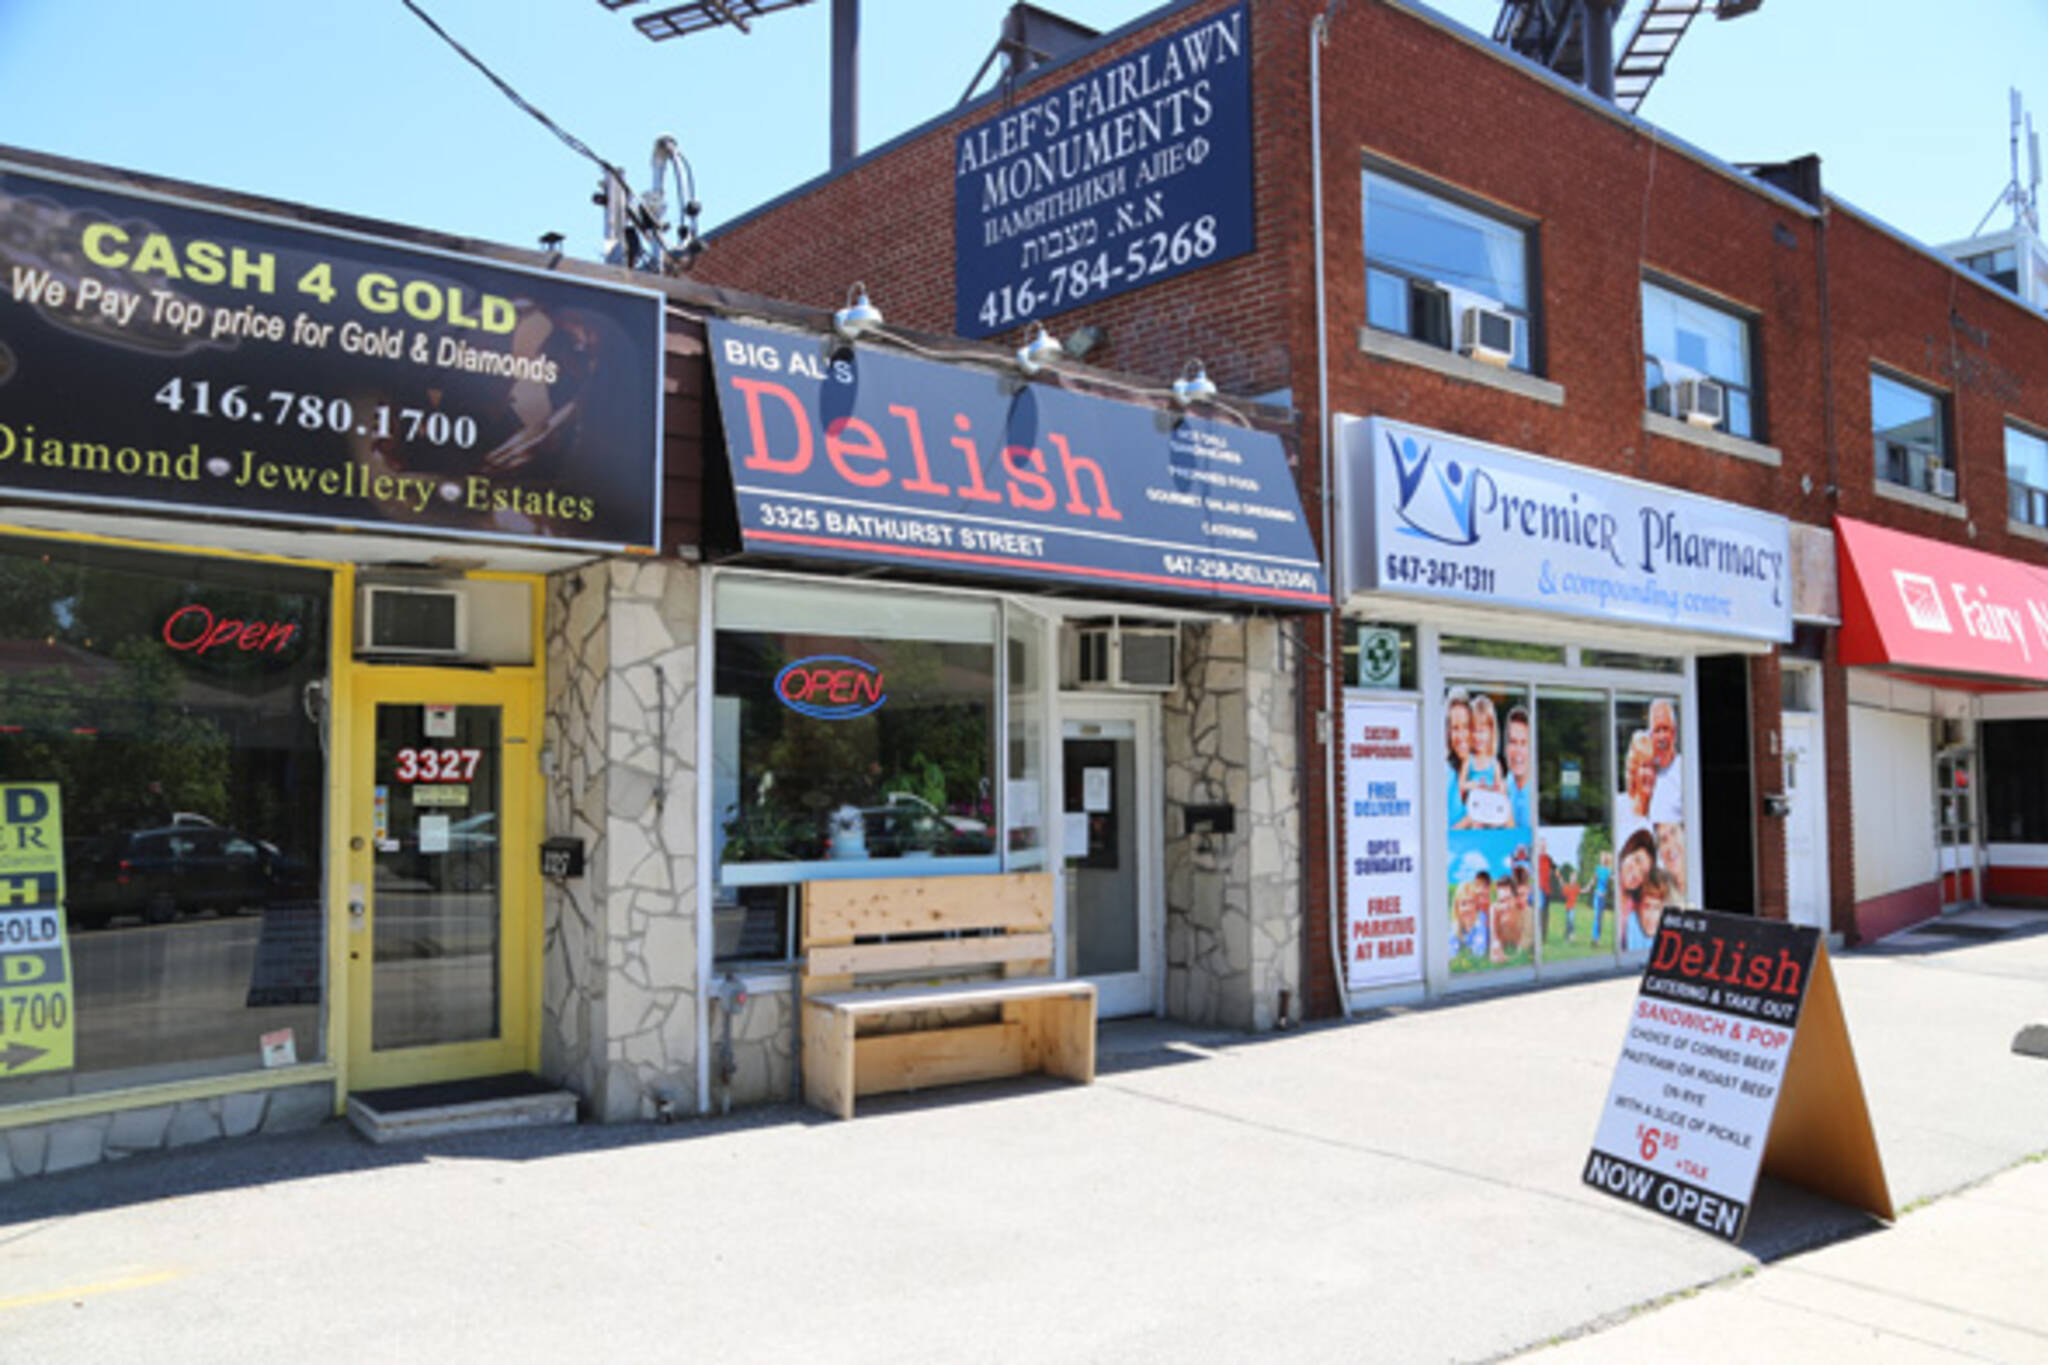 Big Al's Delish Toronto